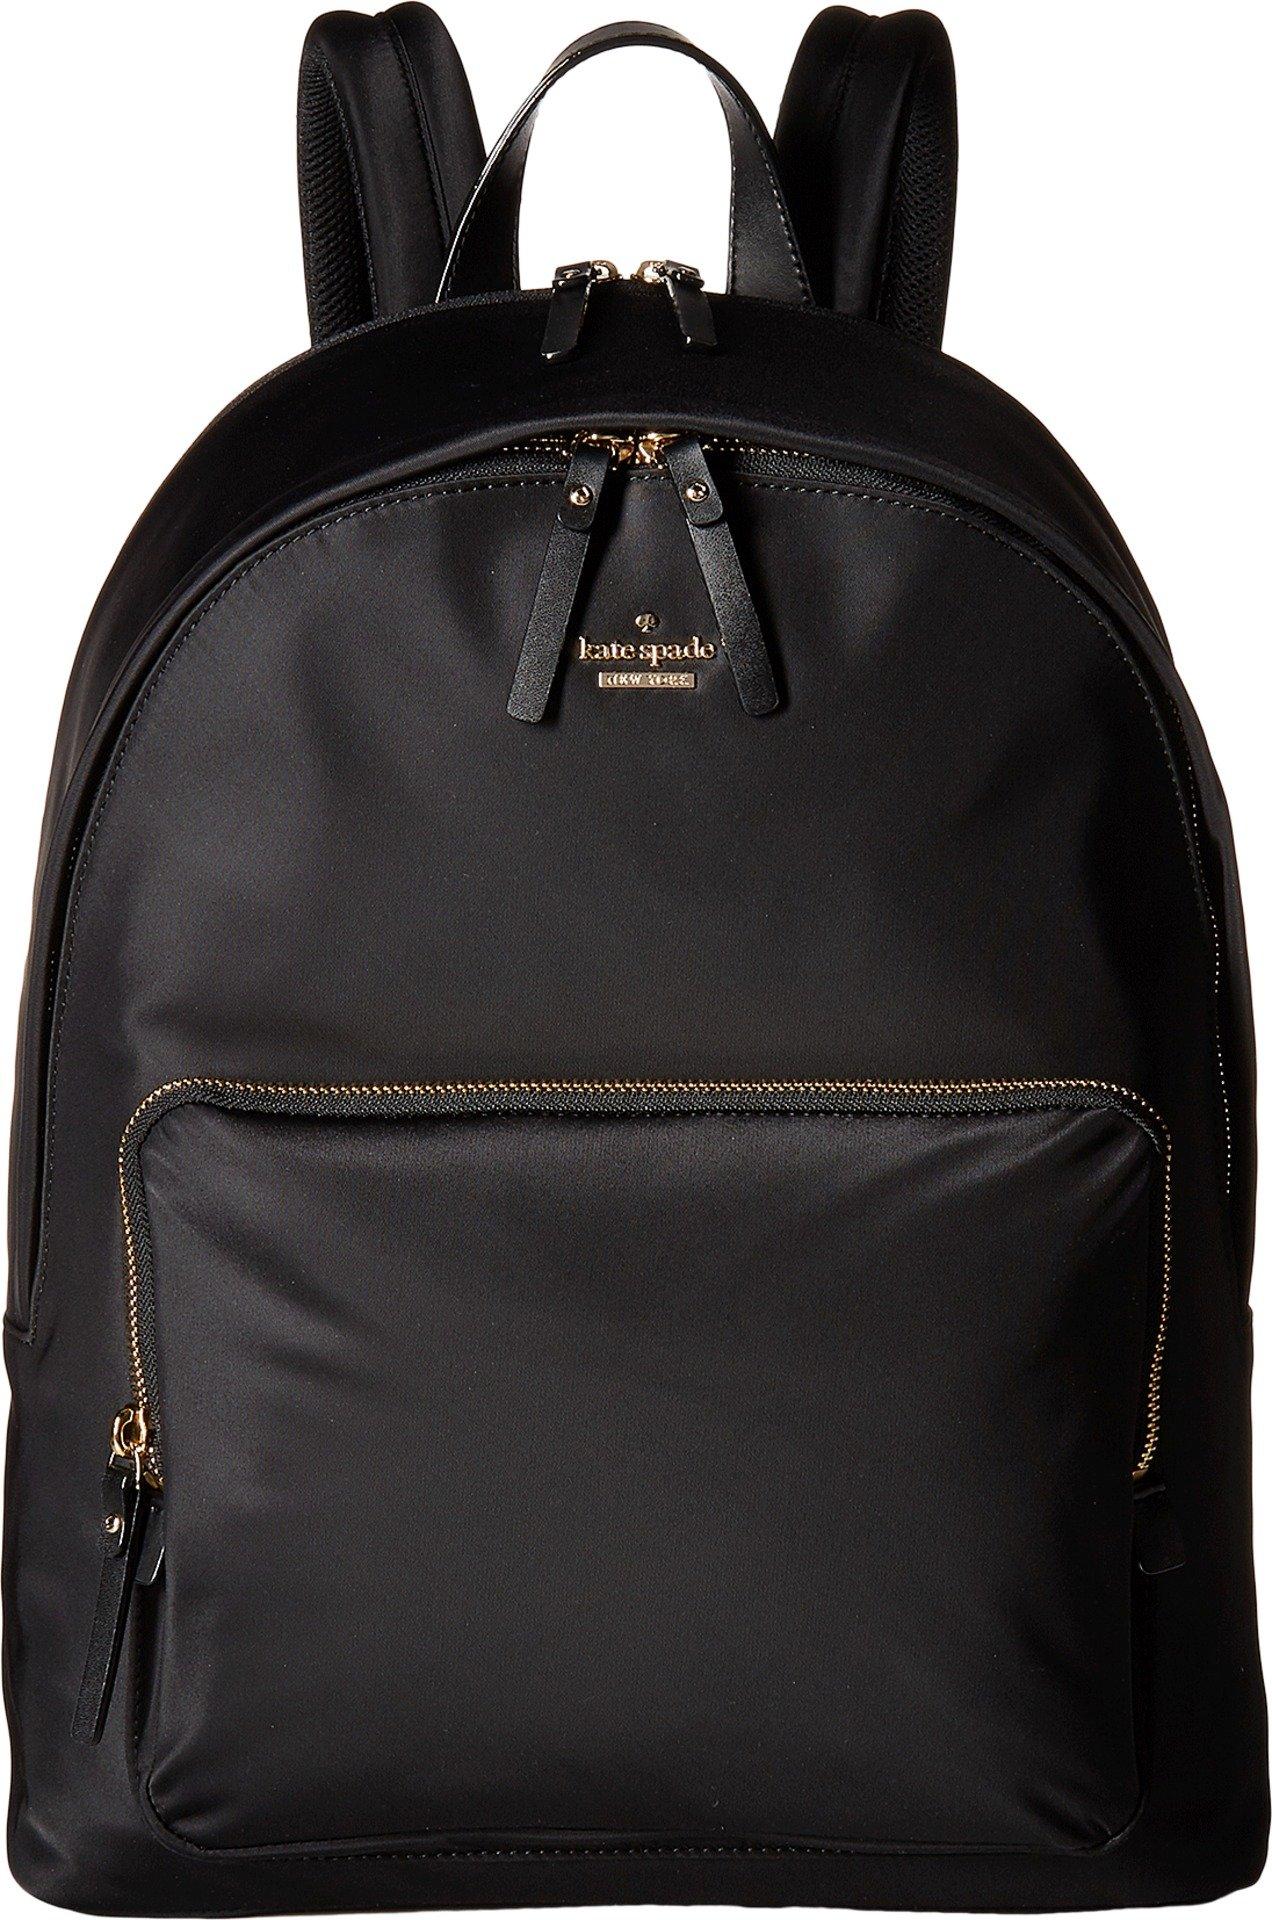 Kate Spade New York Nylon Tech Backpack, Black, One Size